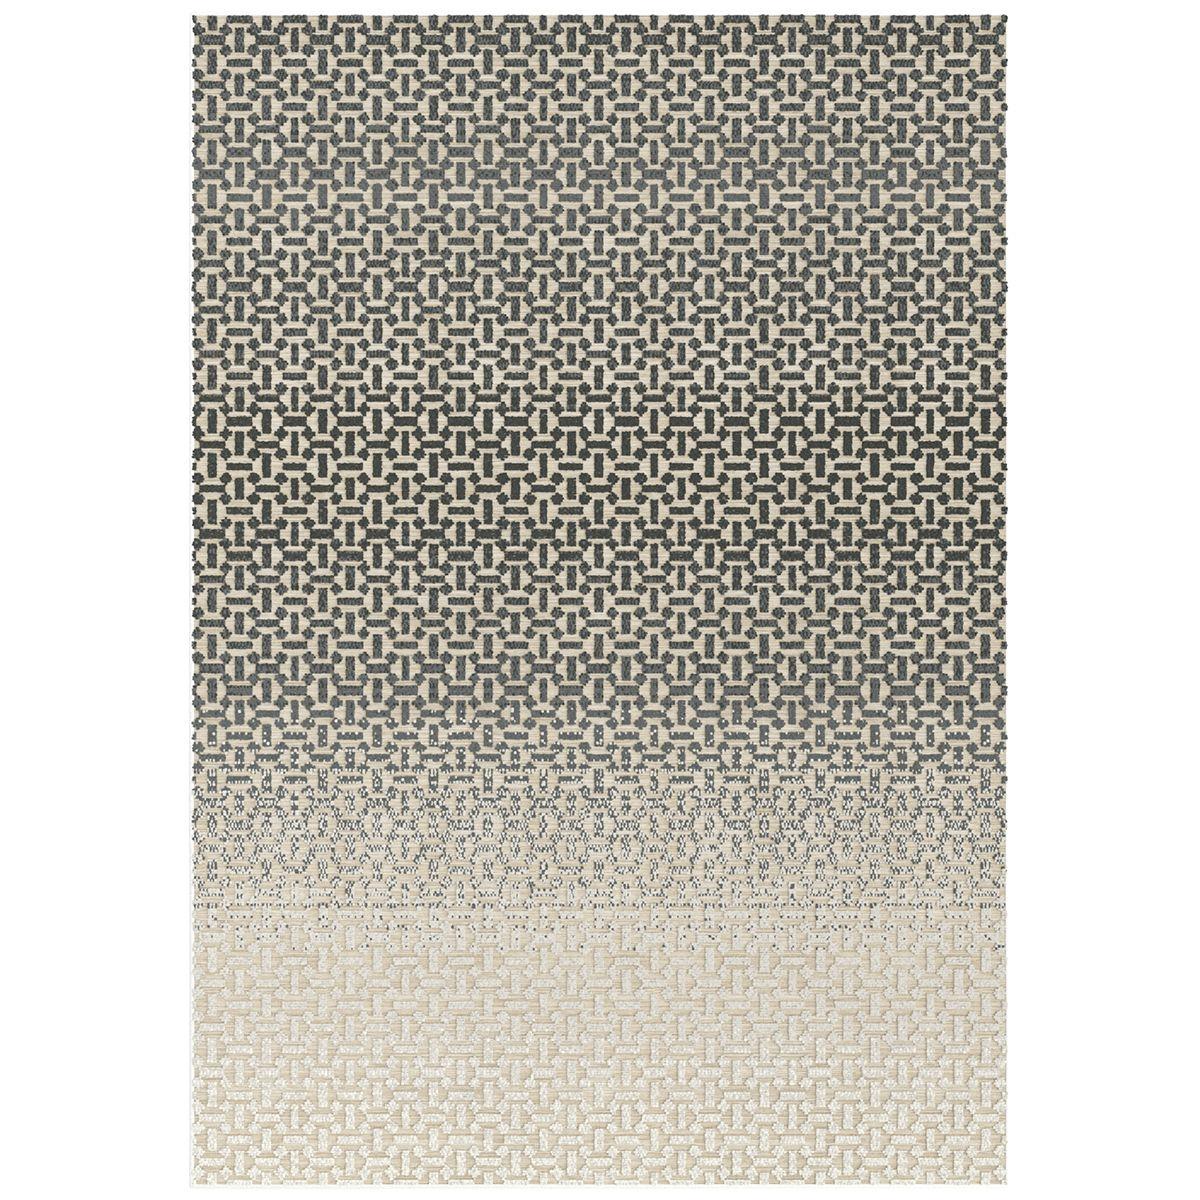 Tapis relief effet tie&dye taupe Nuptso 160x230 cm